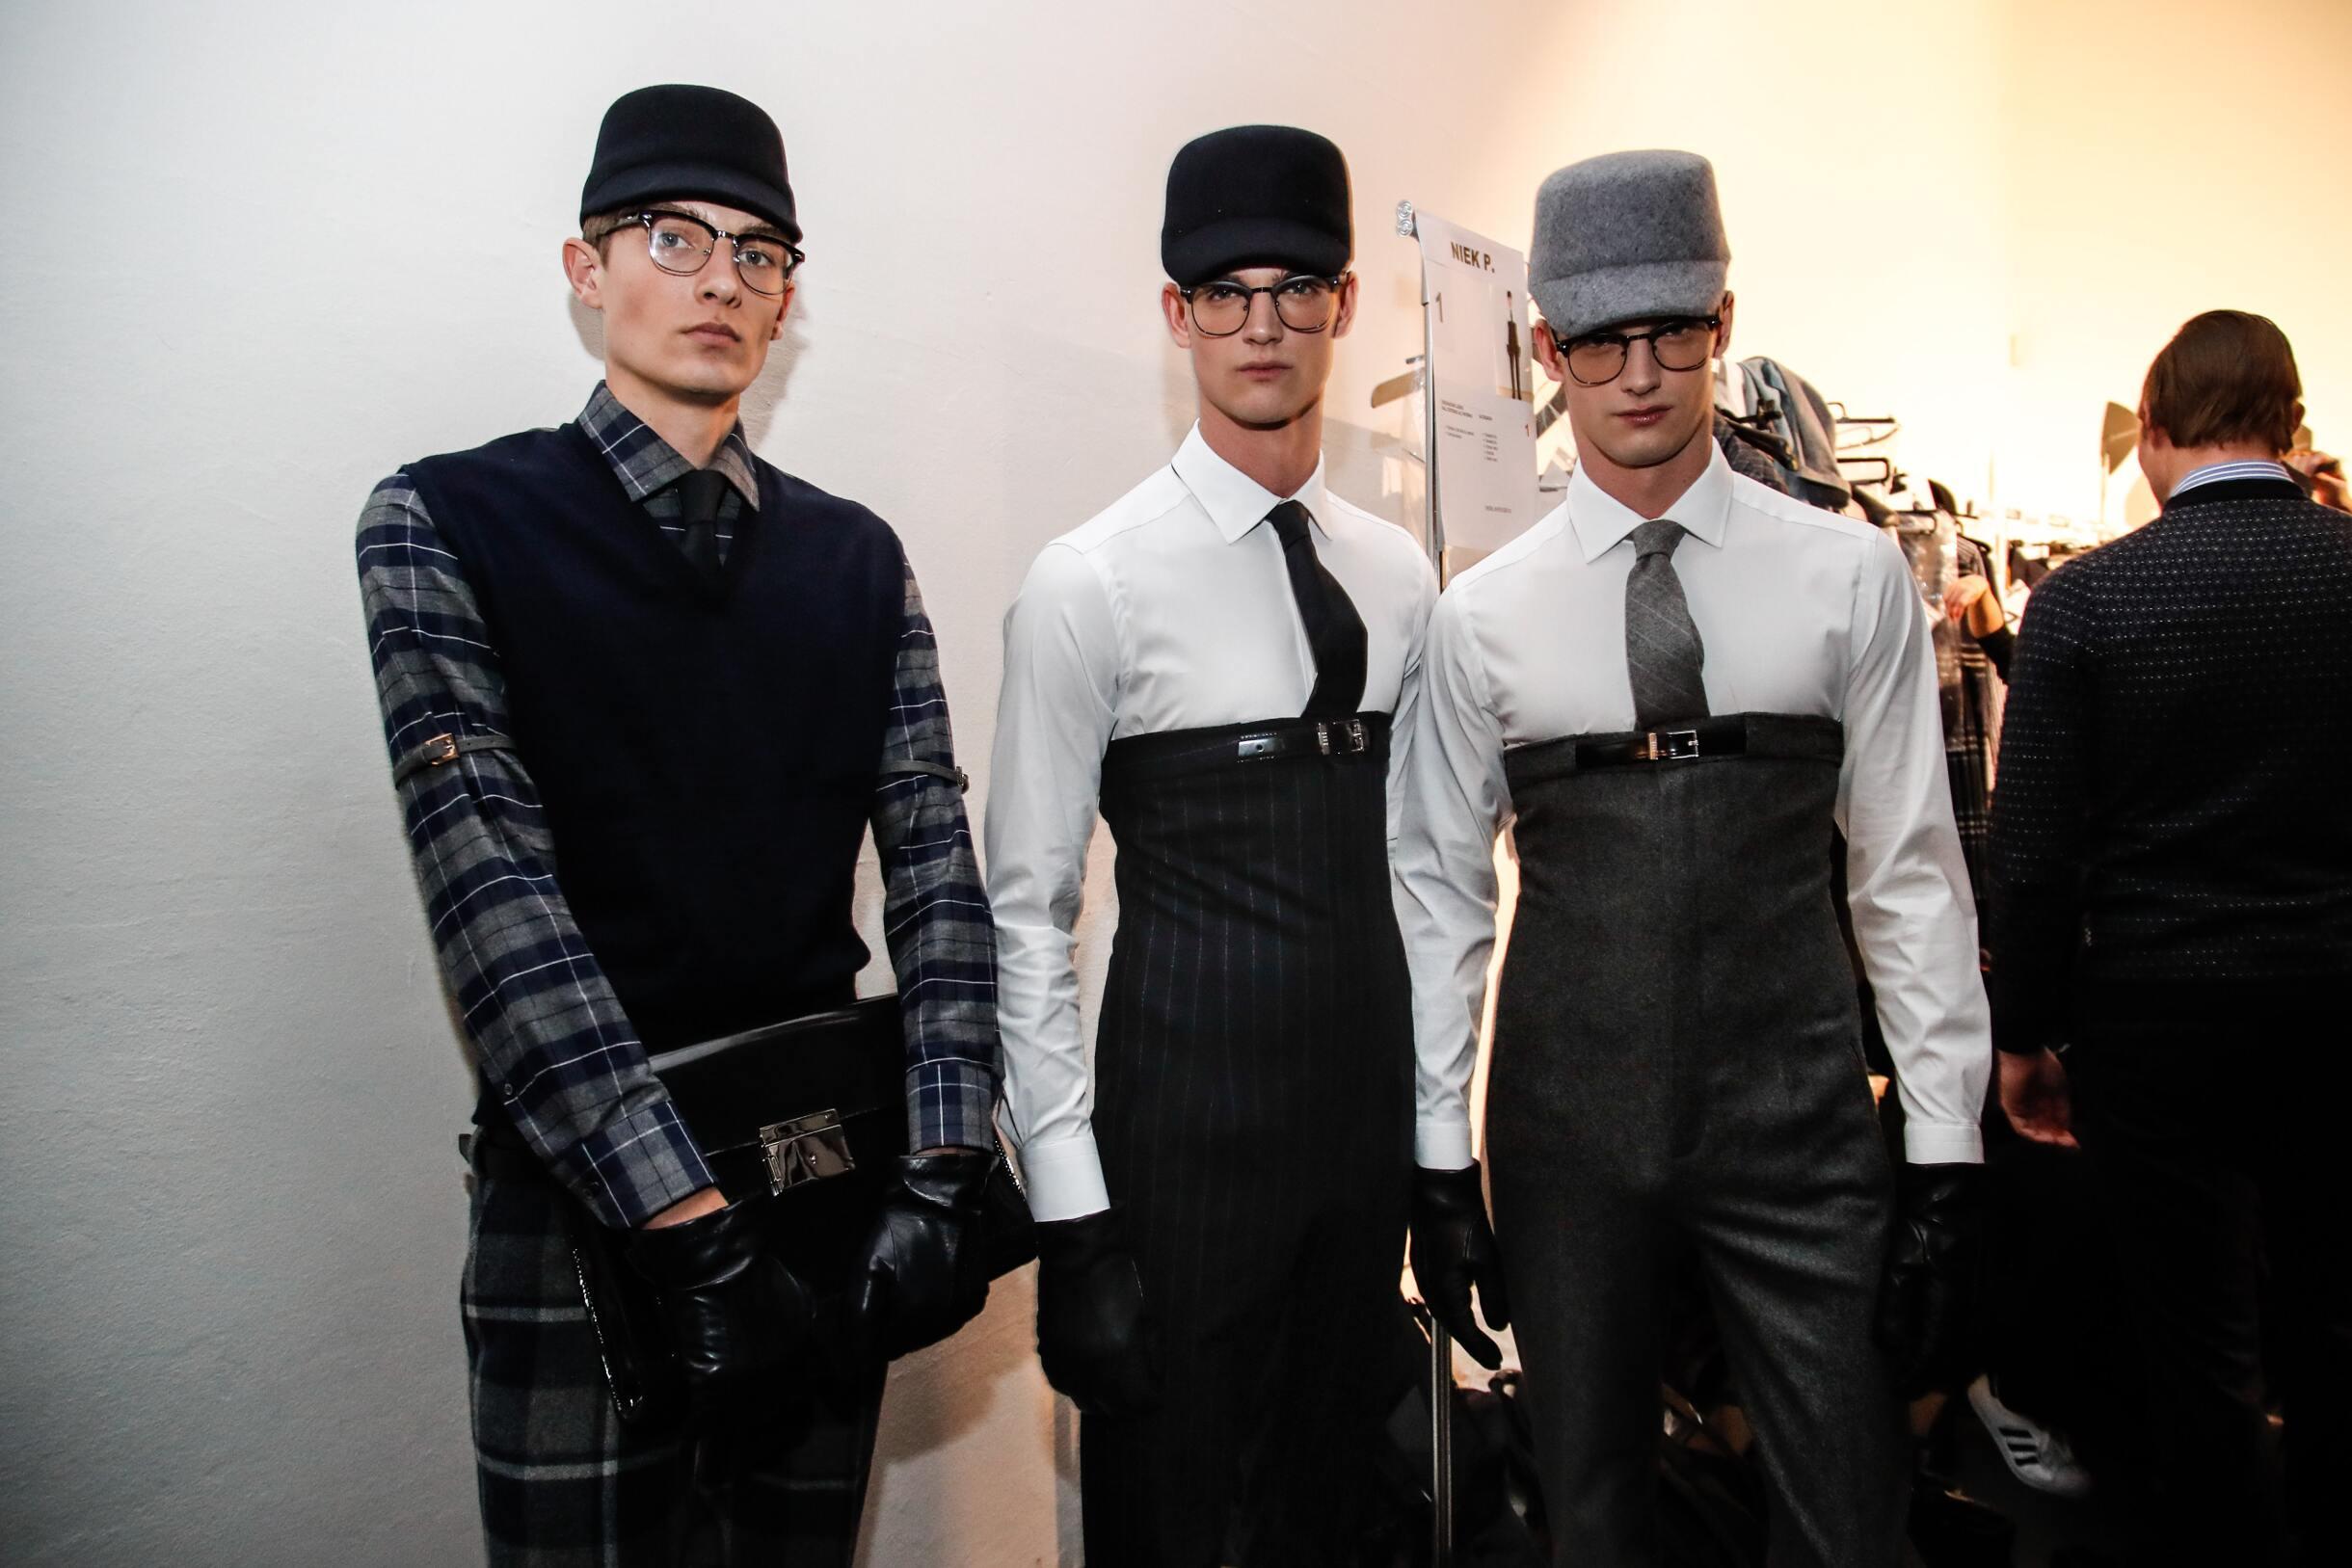 Men Models Daks Backstage Milan Fall Winter 2017-18